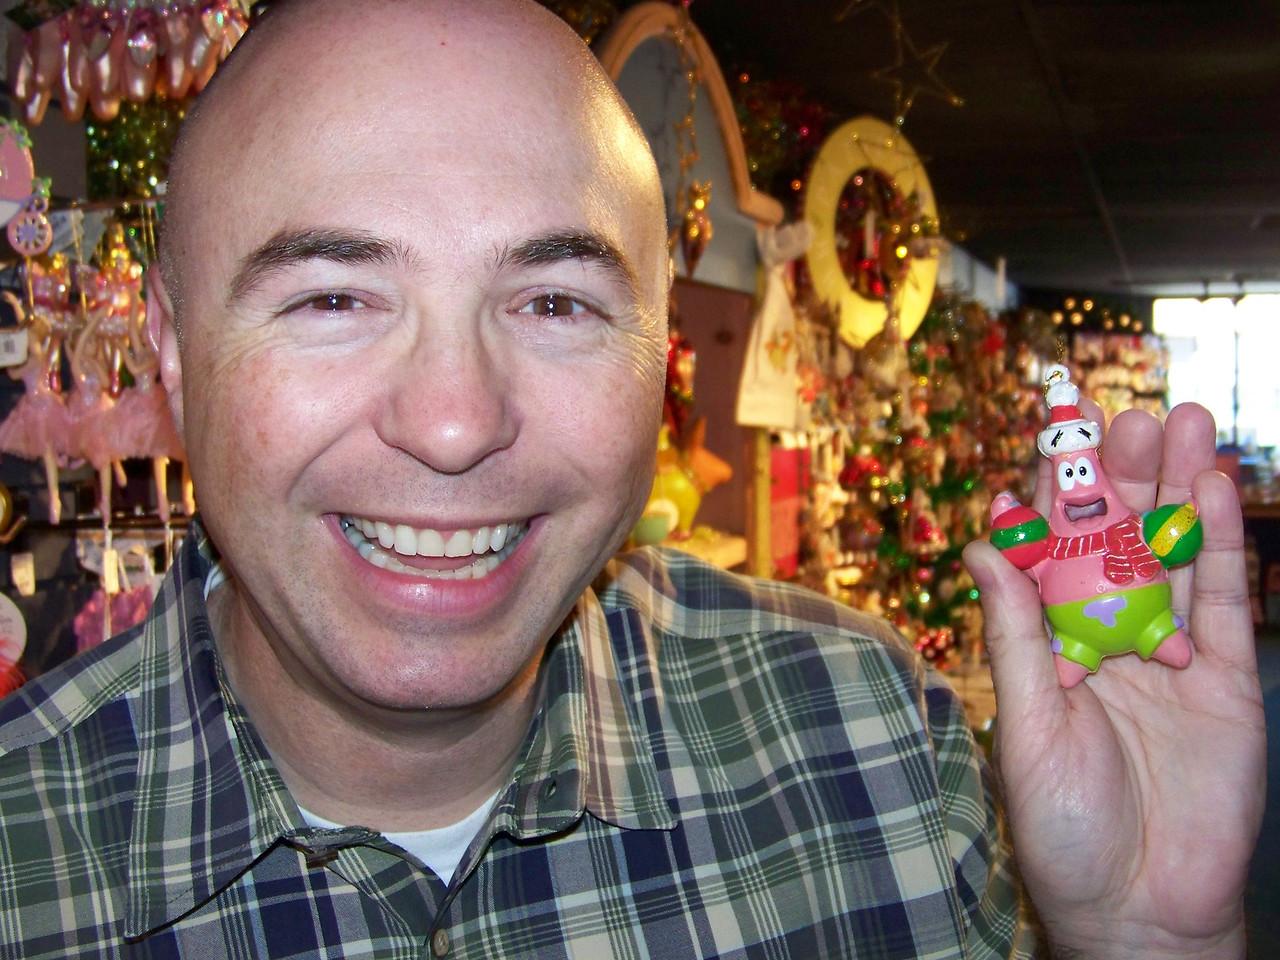 Pat and Patrick in the Kris Kringl Christmas shop.<br /> [Leavenworth, WA]